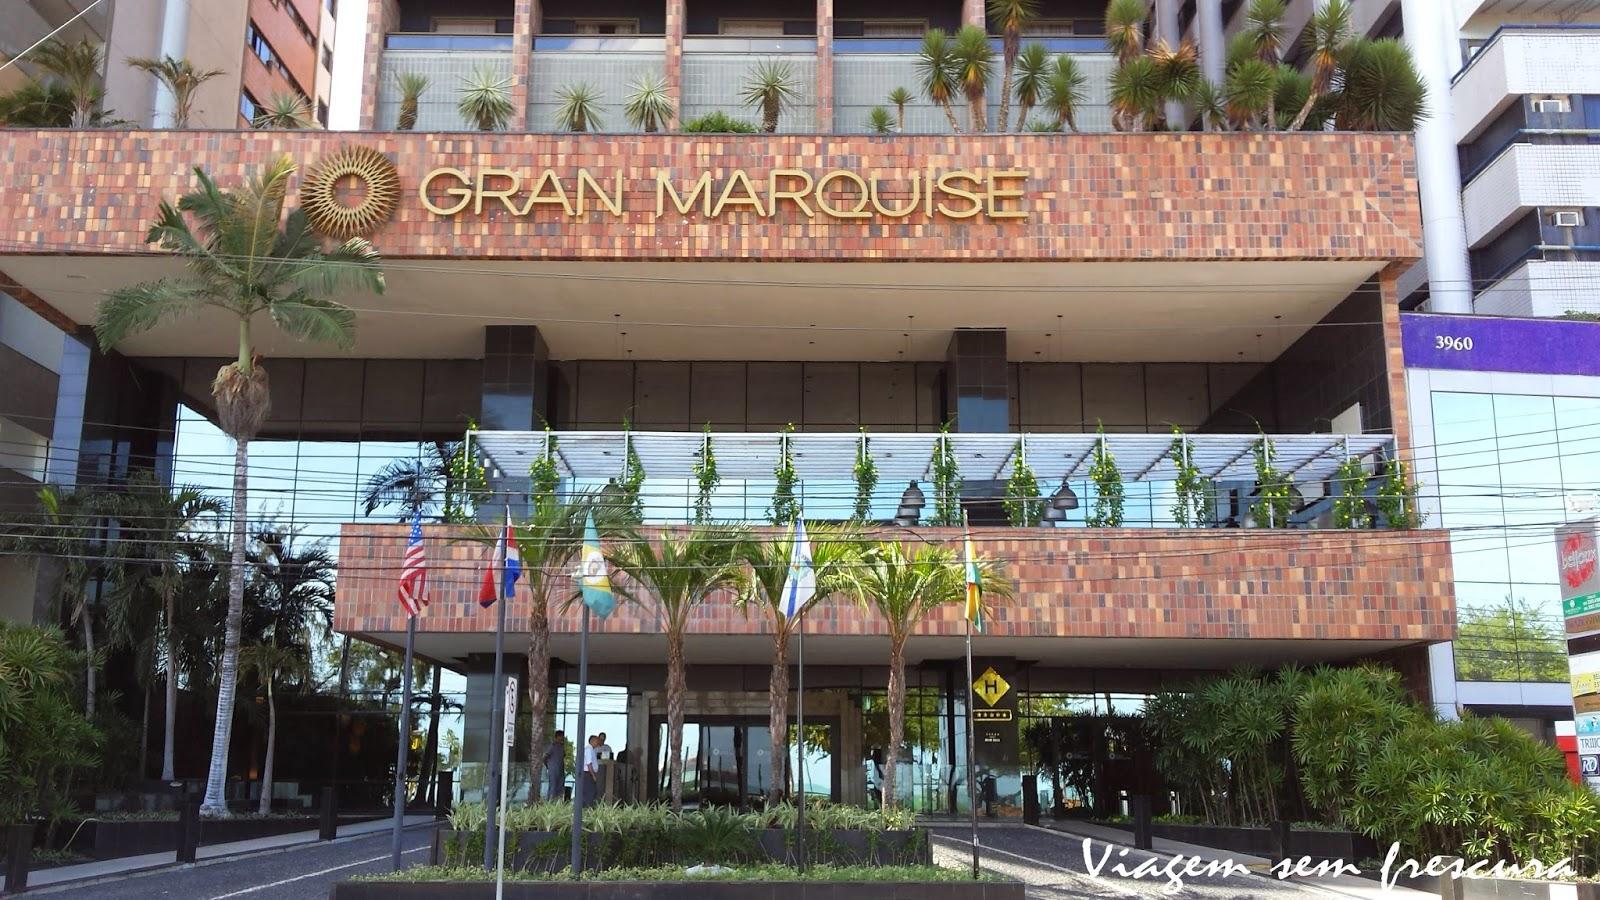 GRAN MARQUISE